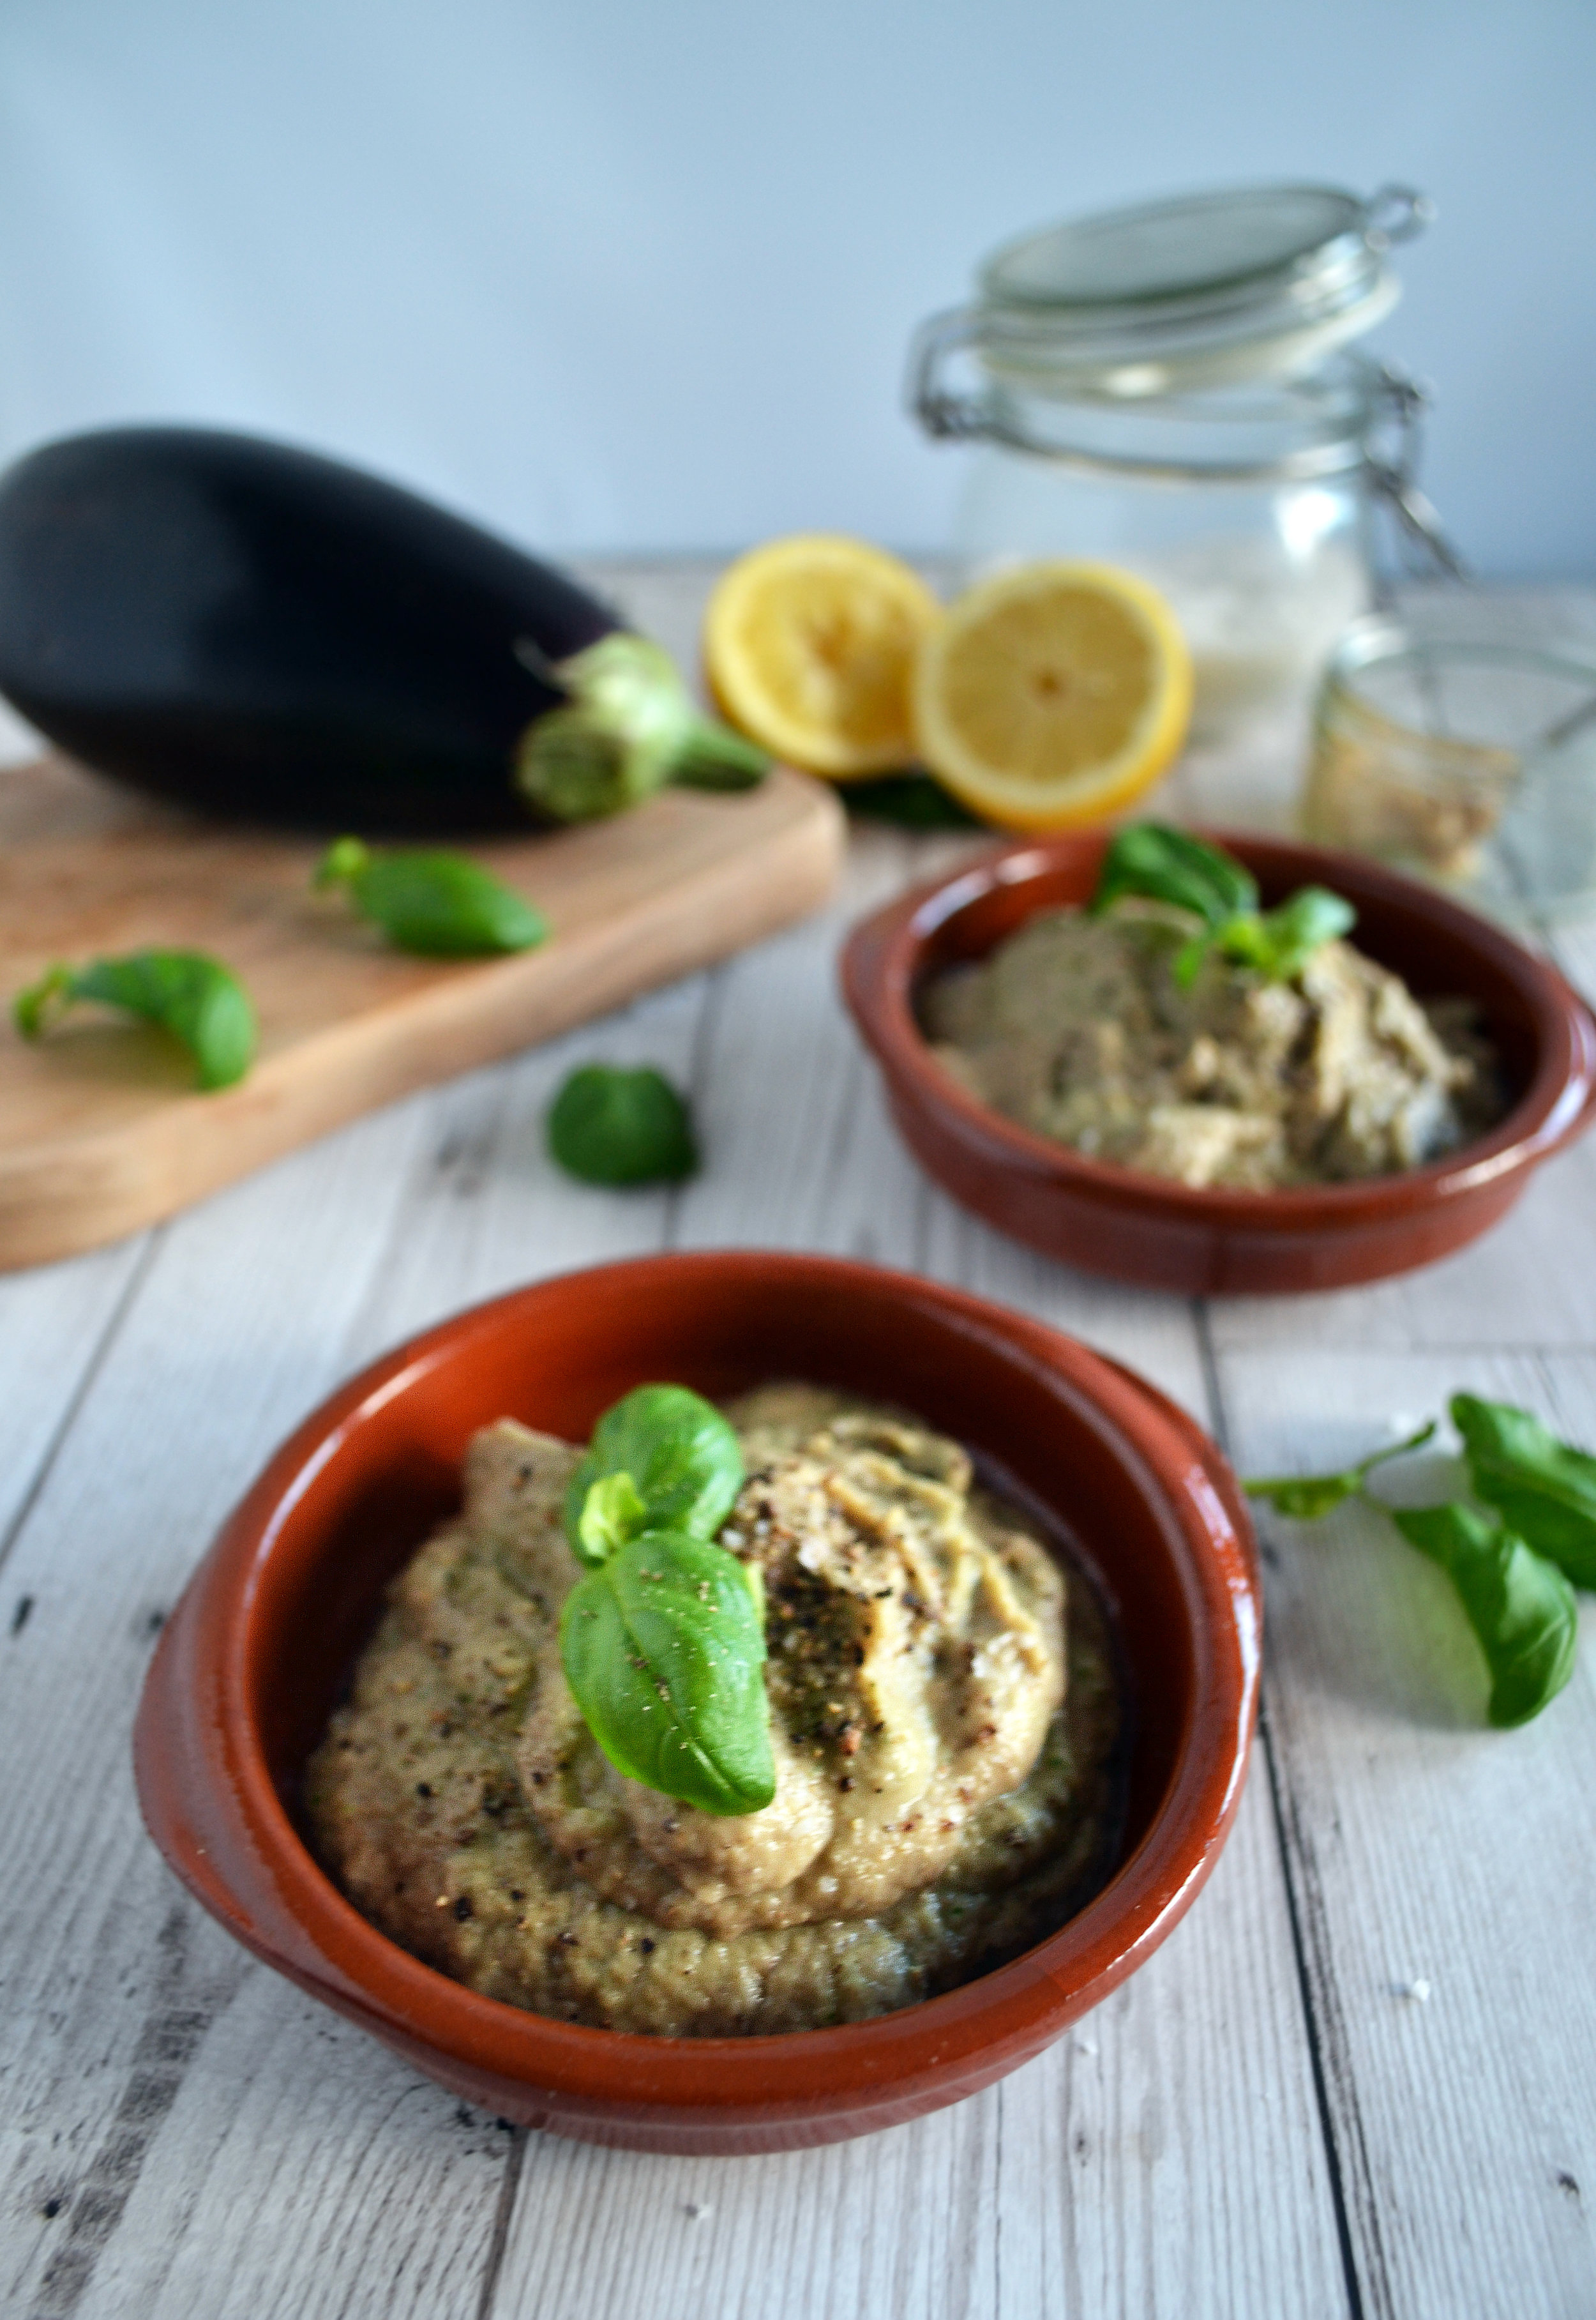 Basil Baba Ganoush recipe | The Flourishing Pantry